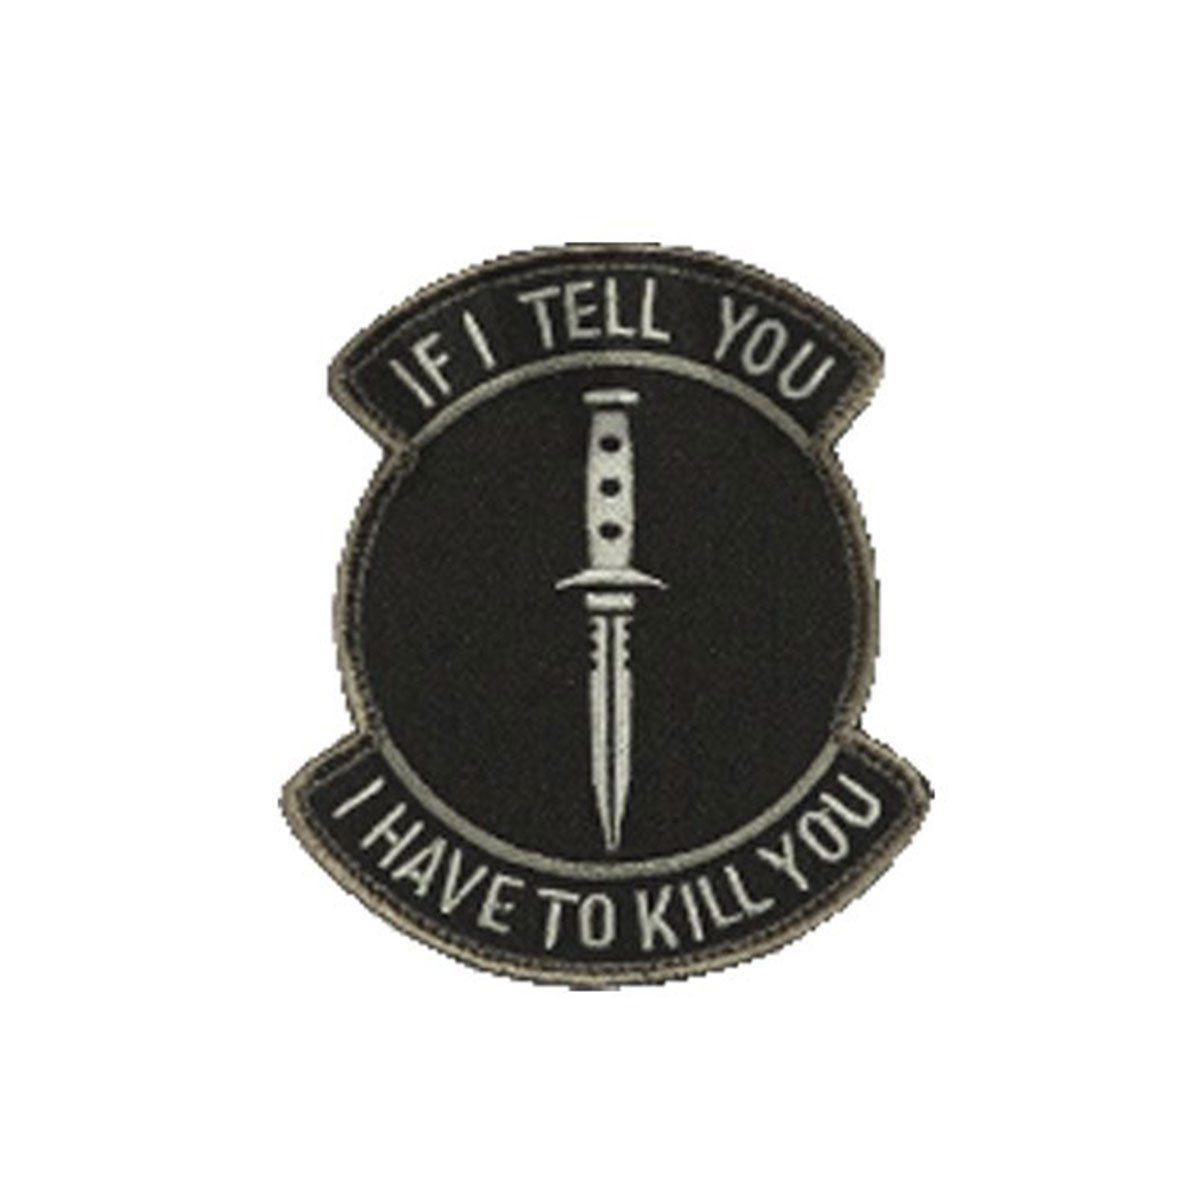 Bordado Termocolante Combate Kill You